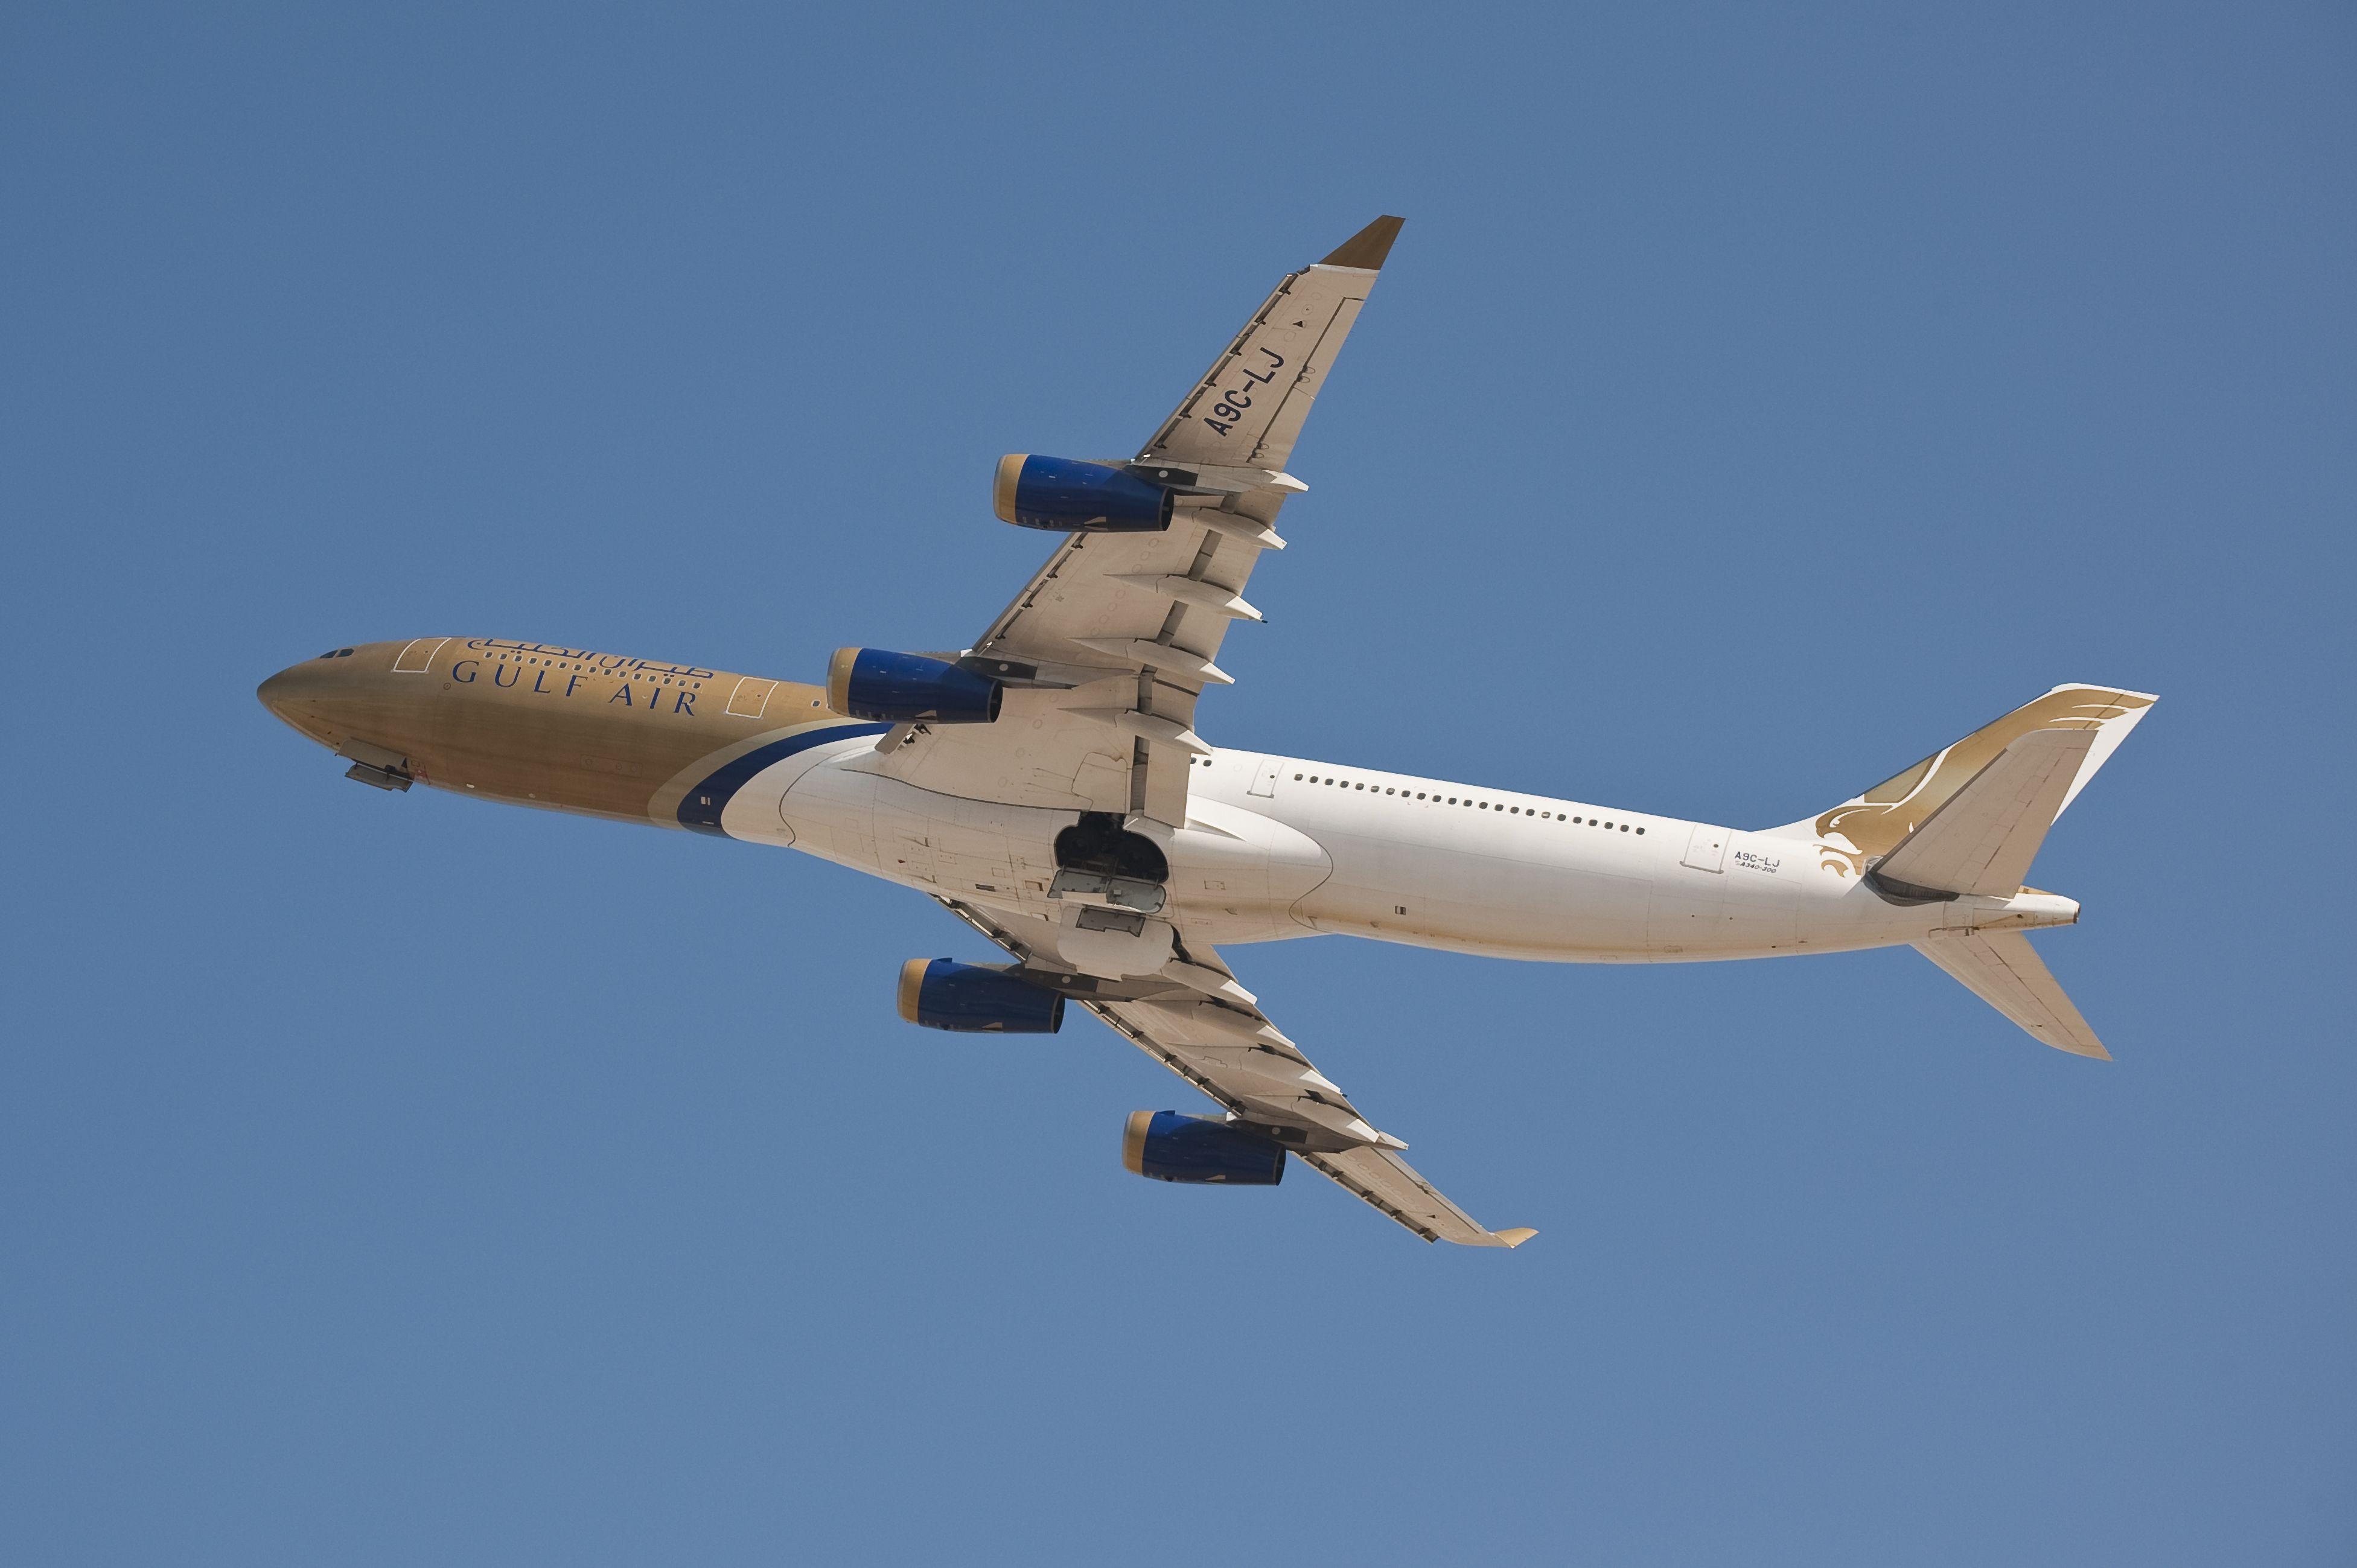 Gulf Air Airlines Operating Flights Into Muscat Oman Mct Oman Qatar Airways Qatar